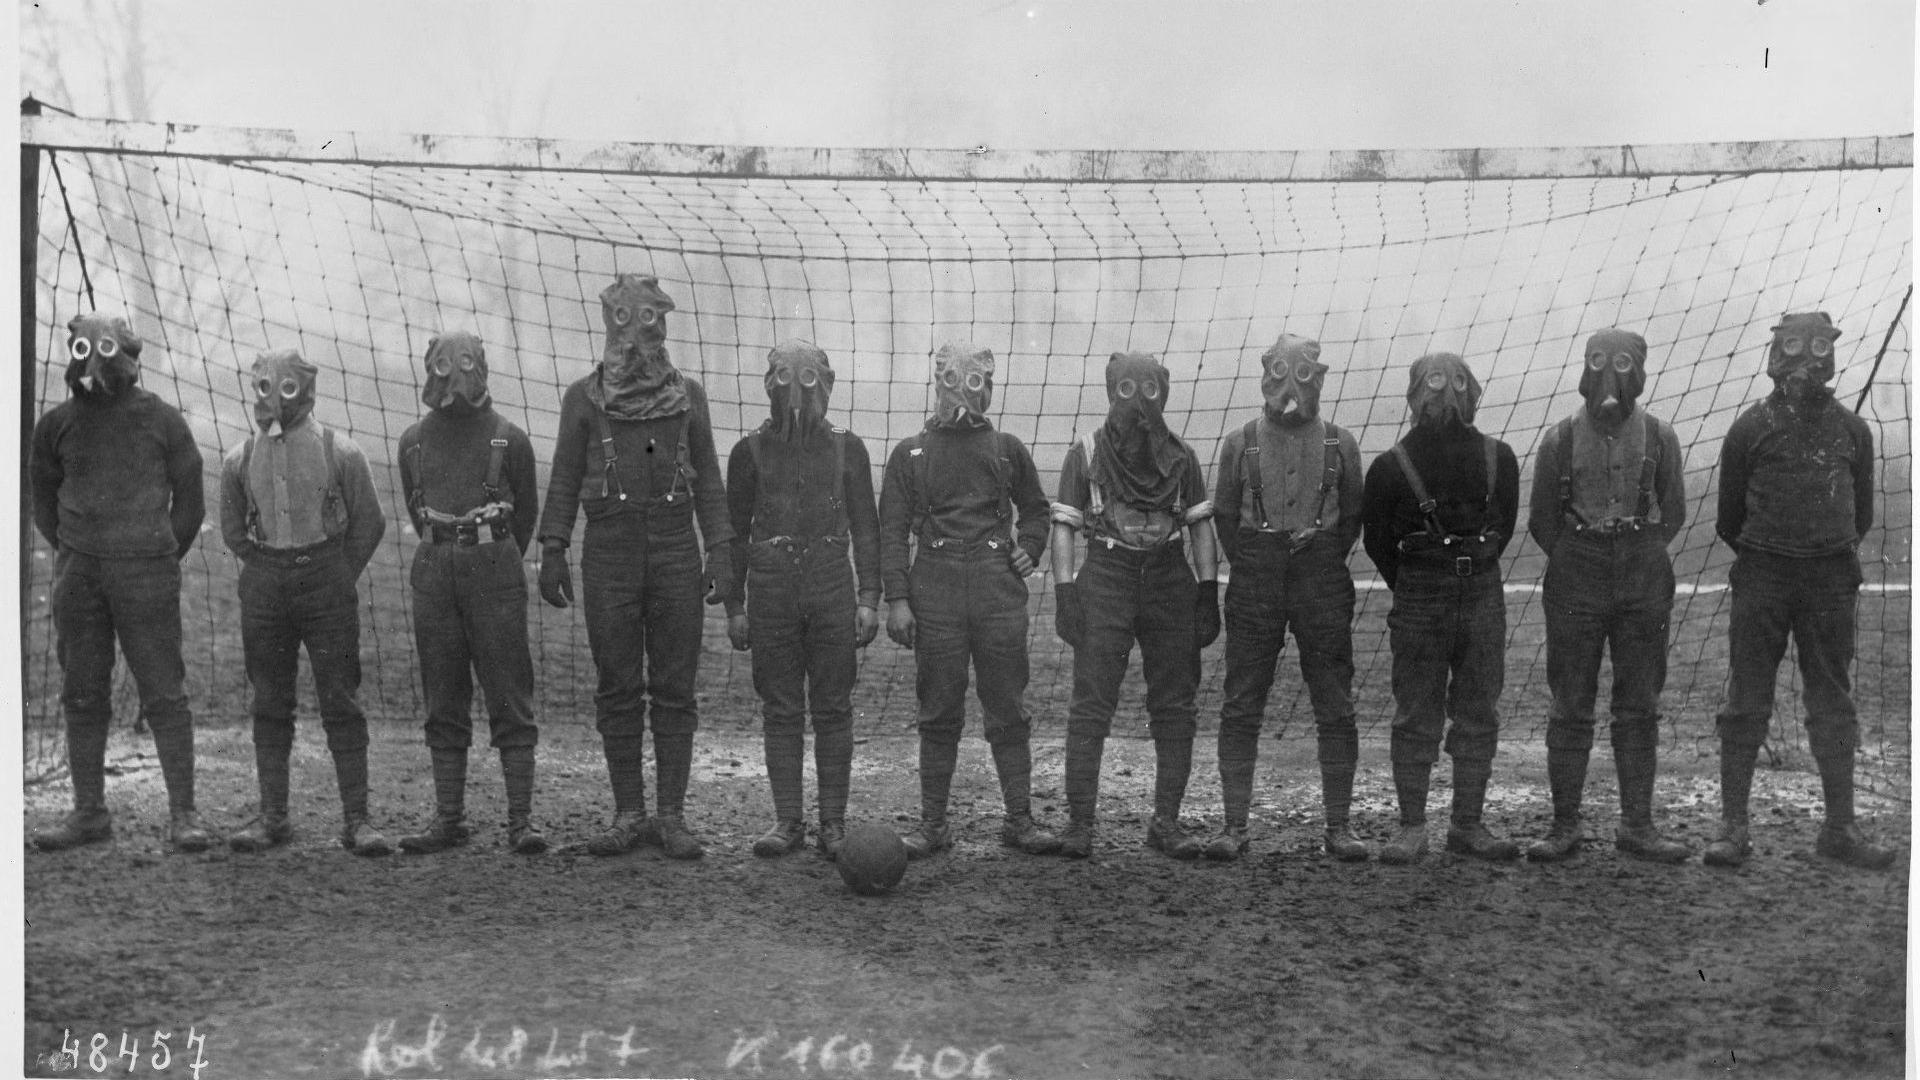 World_War_I_British_soccer_team_with_gas_masks_1916